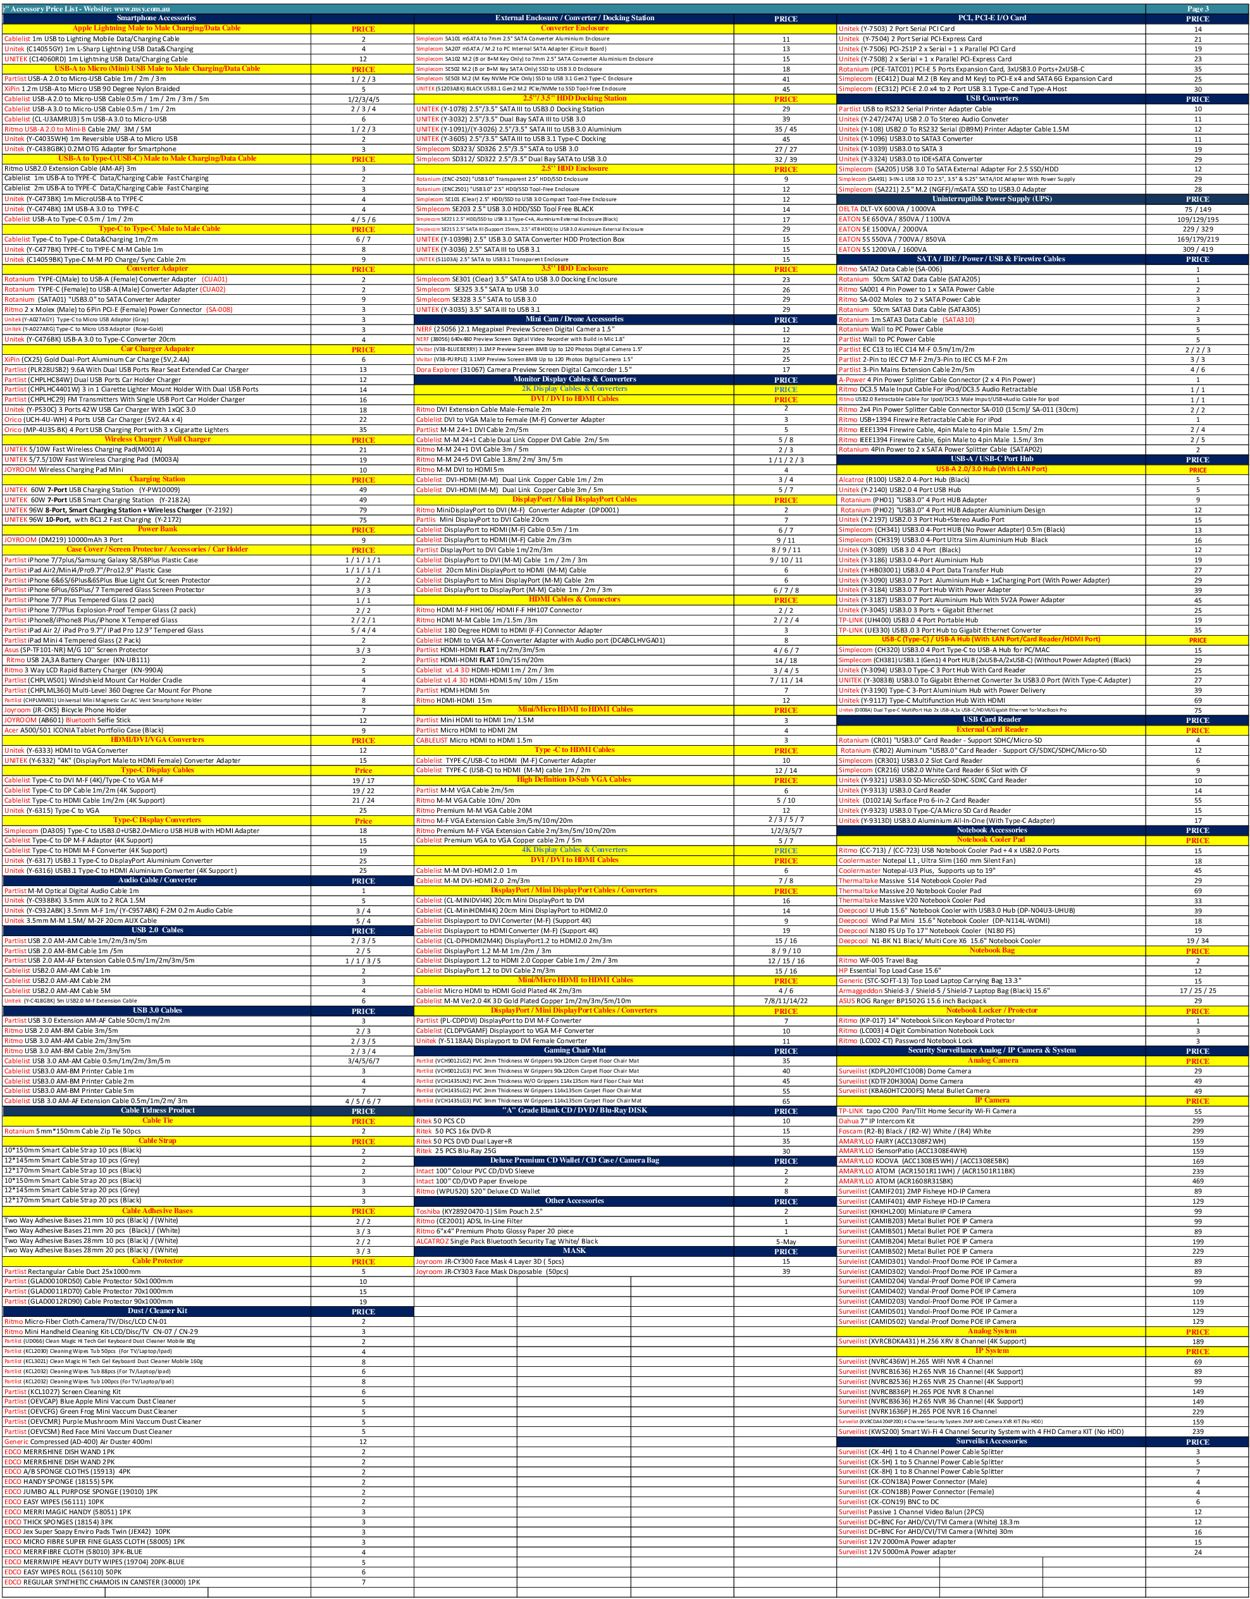 MSY Technology Catalogue - 05/01-05/01/2021 (Page 3)